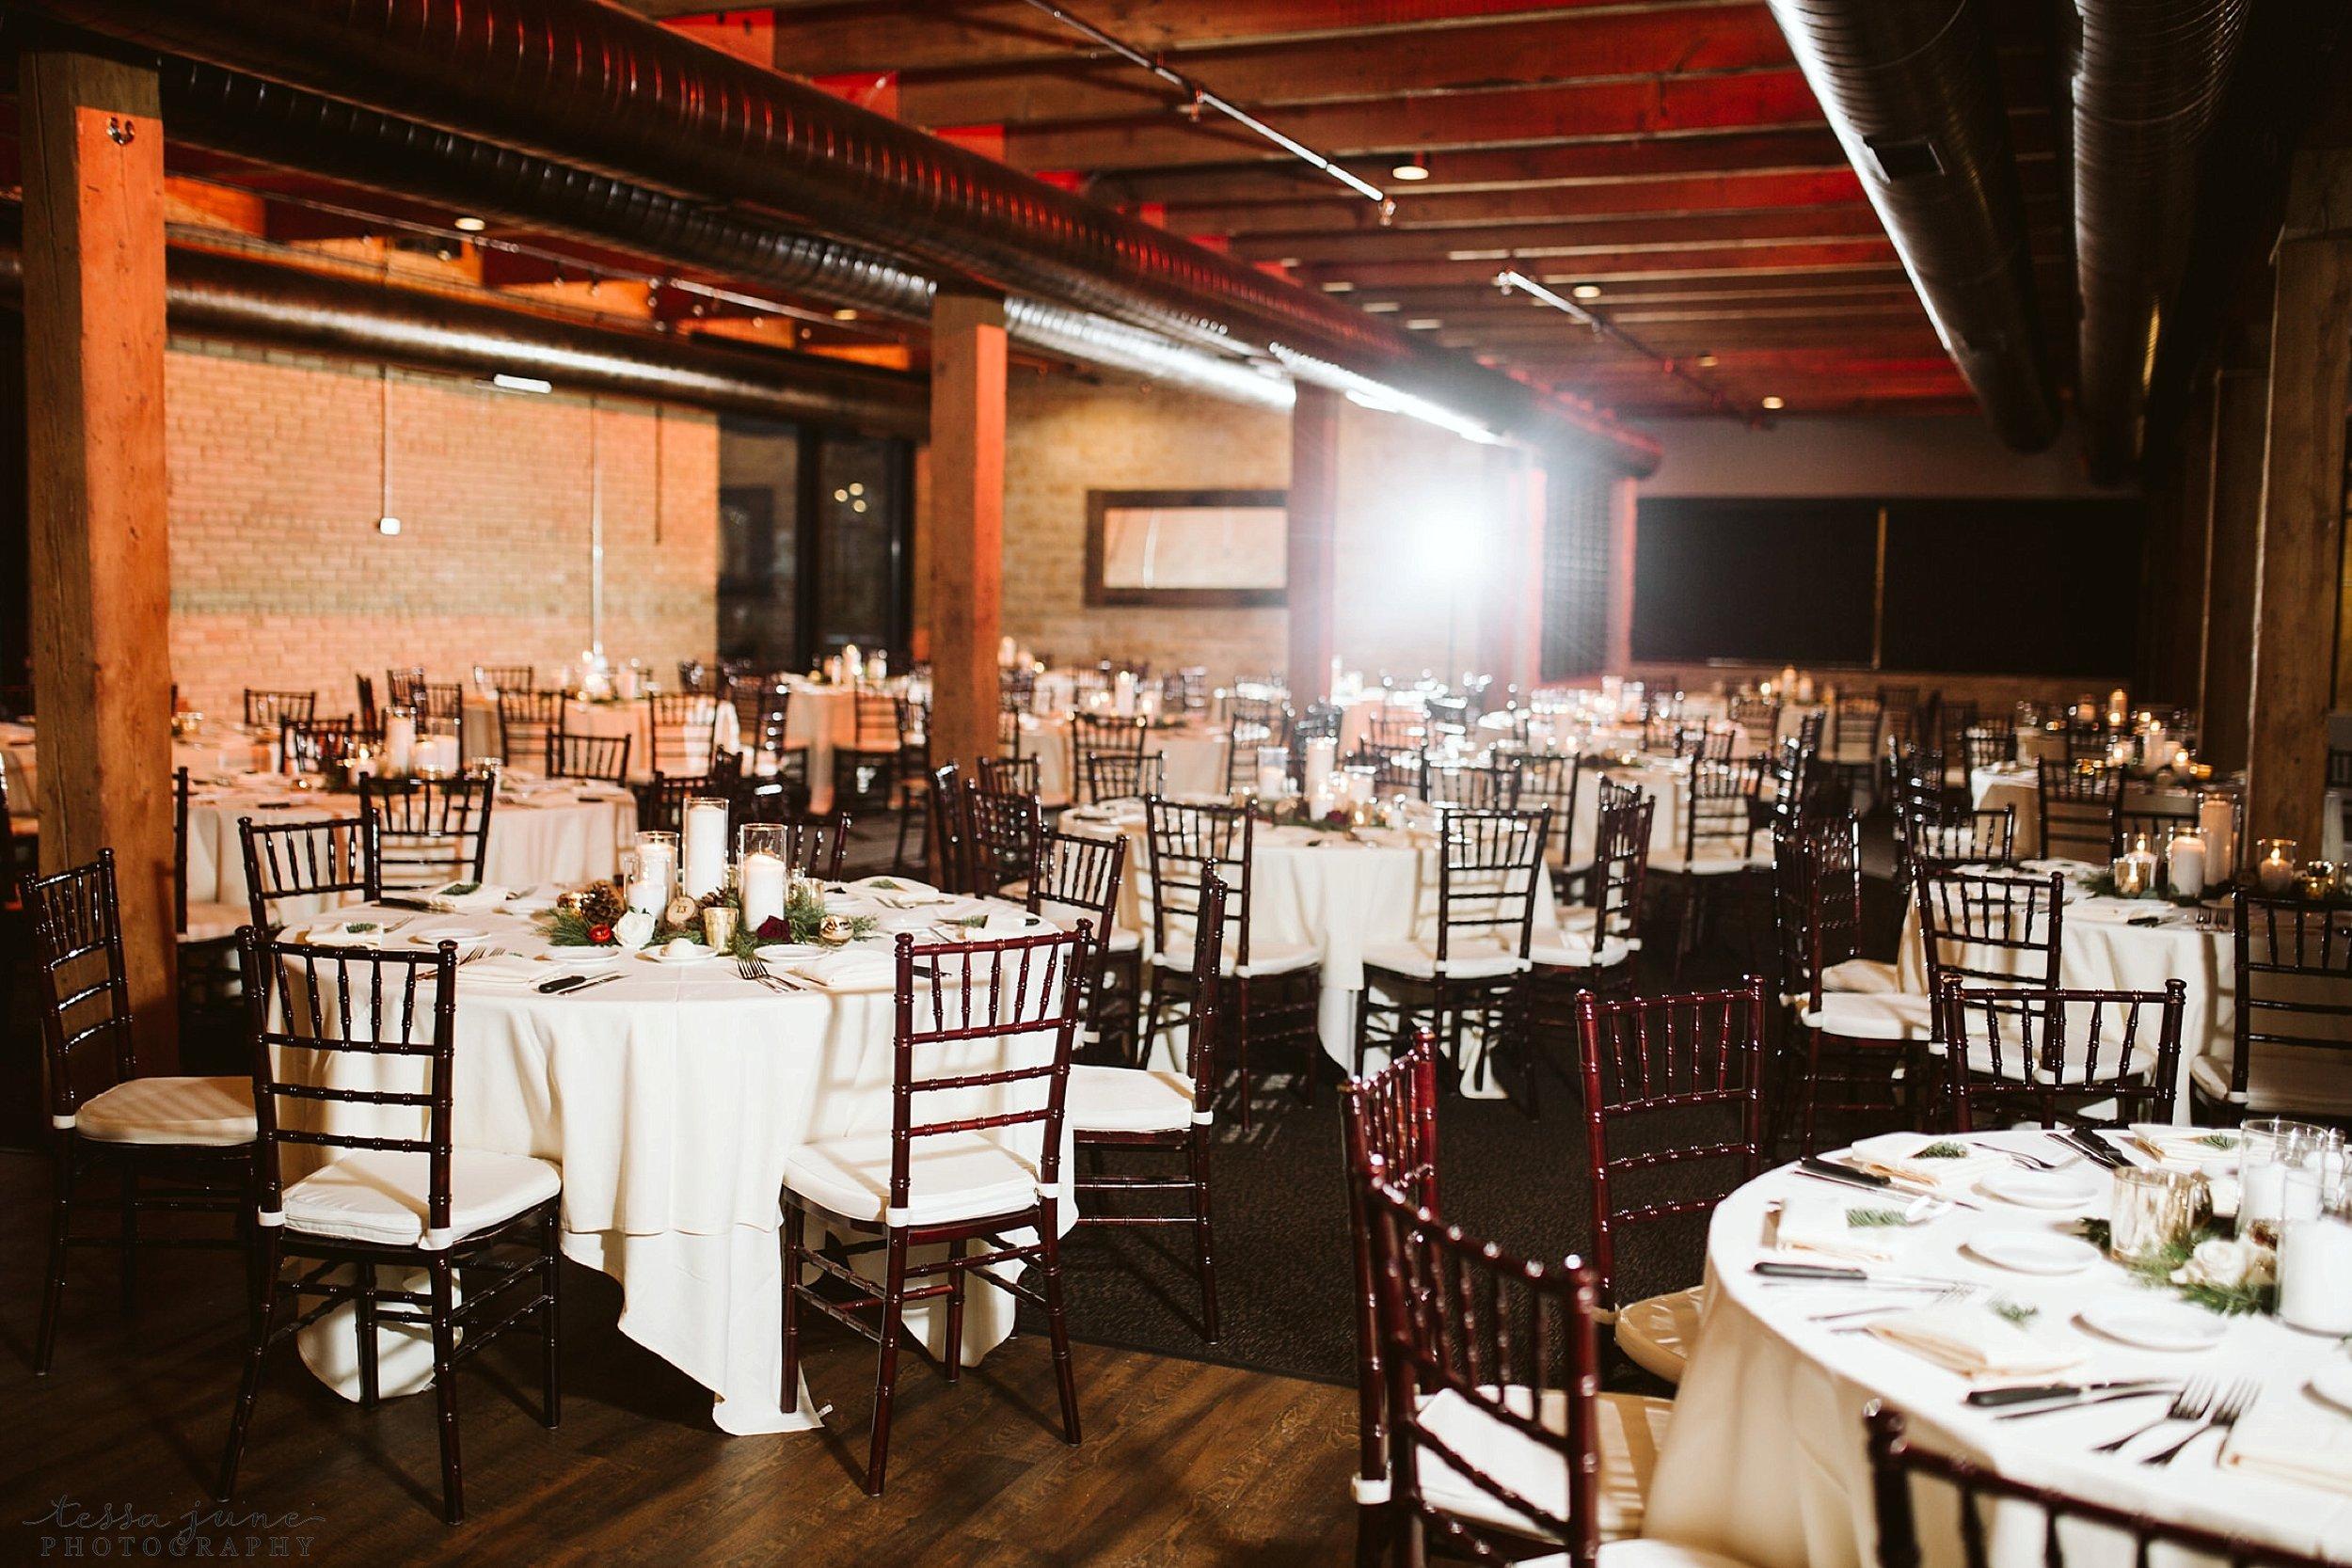 minneapolis-event-center-winter-romantic-snow-wedding-december-161.jpg